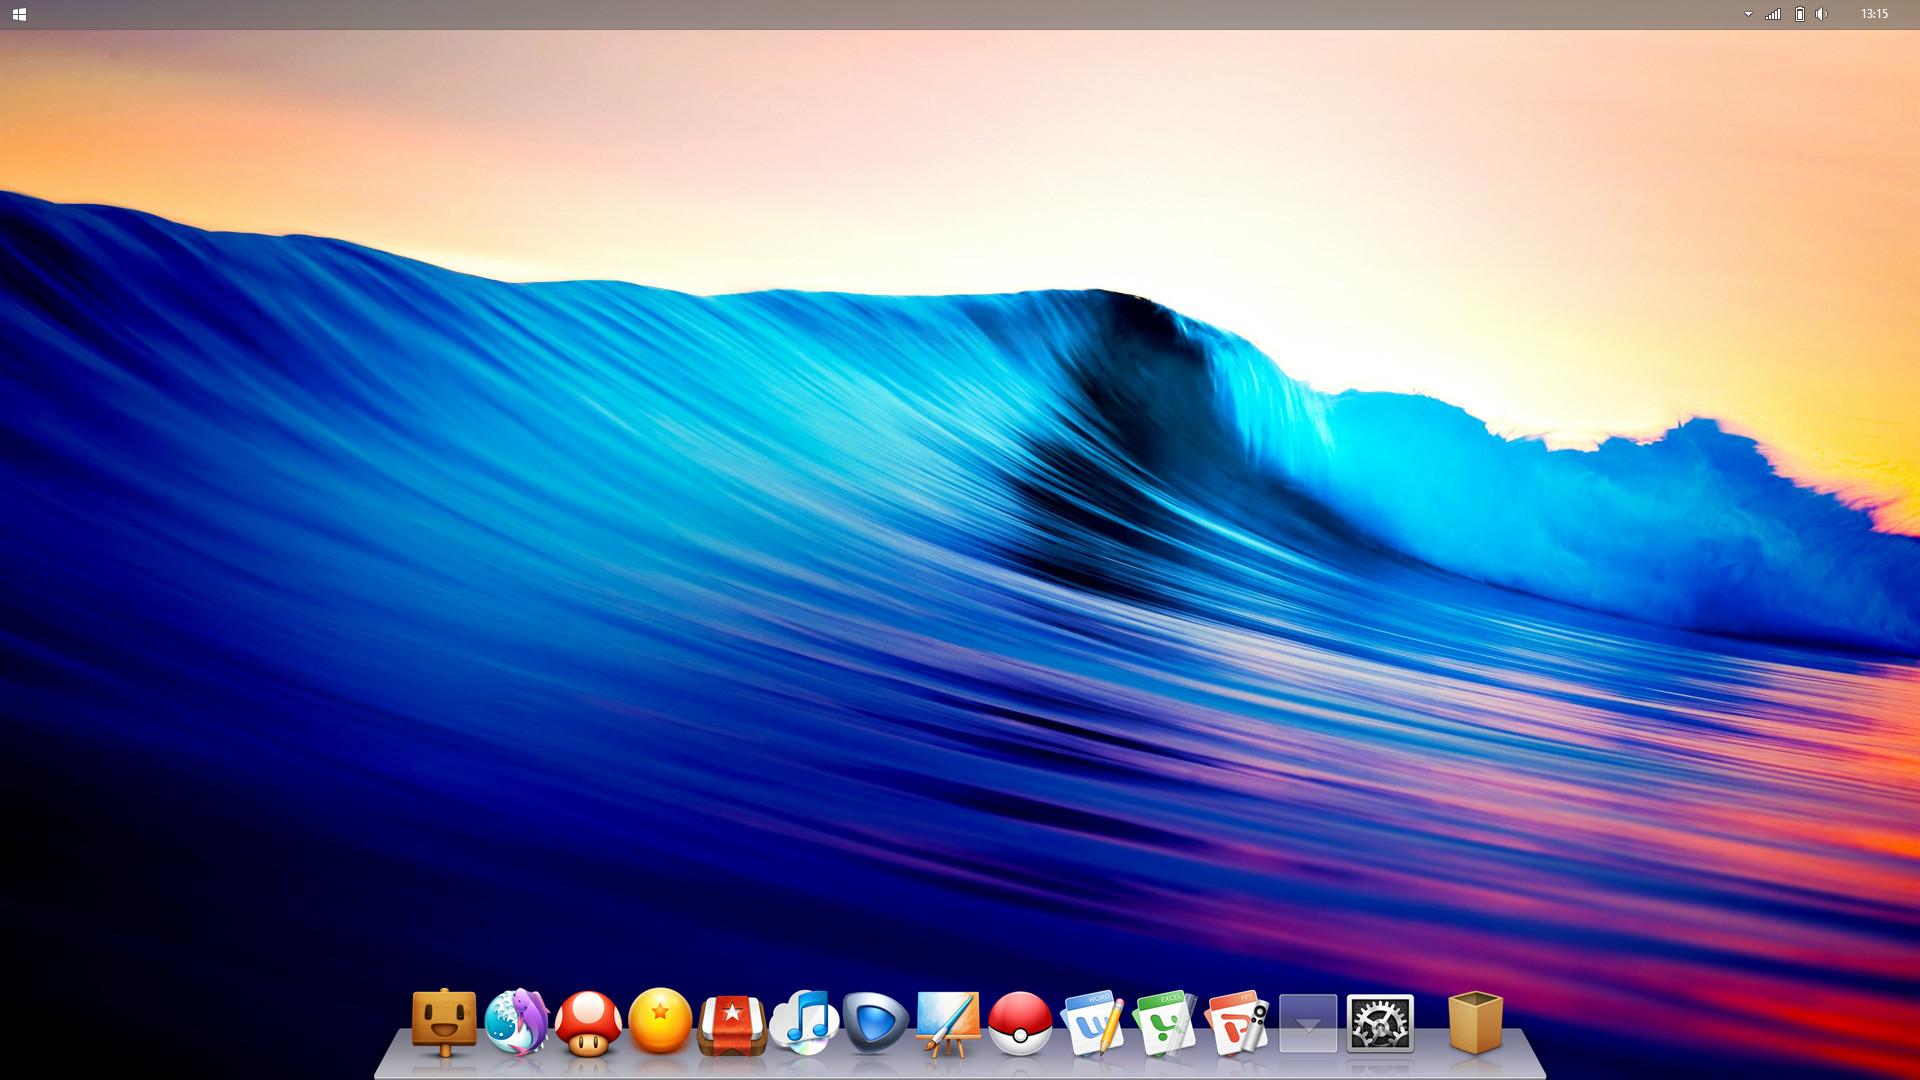 Windows 8.1 Pro Wallpaper Windows 8.1 isn't half bad